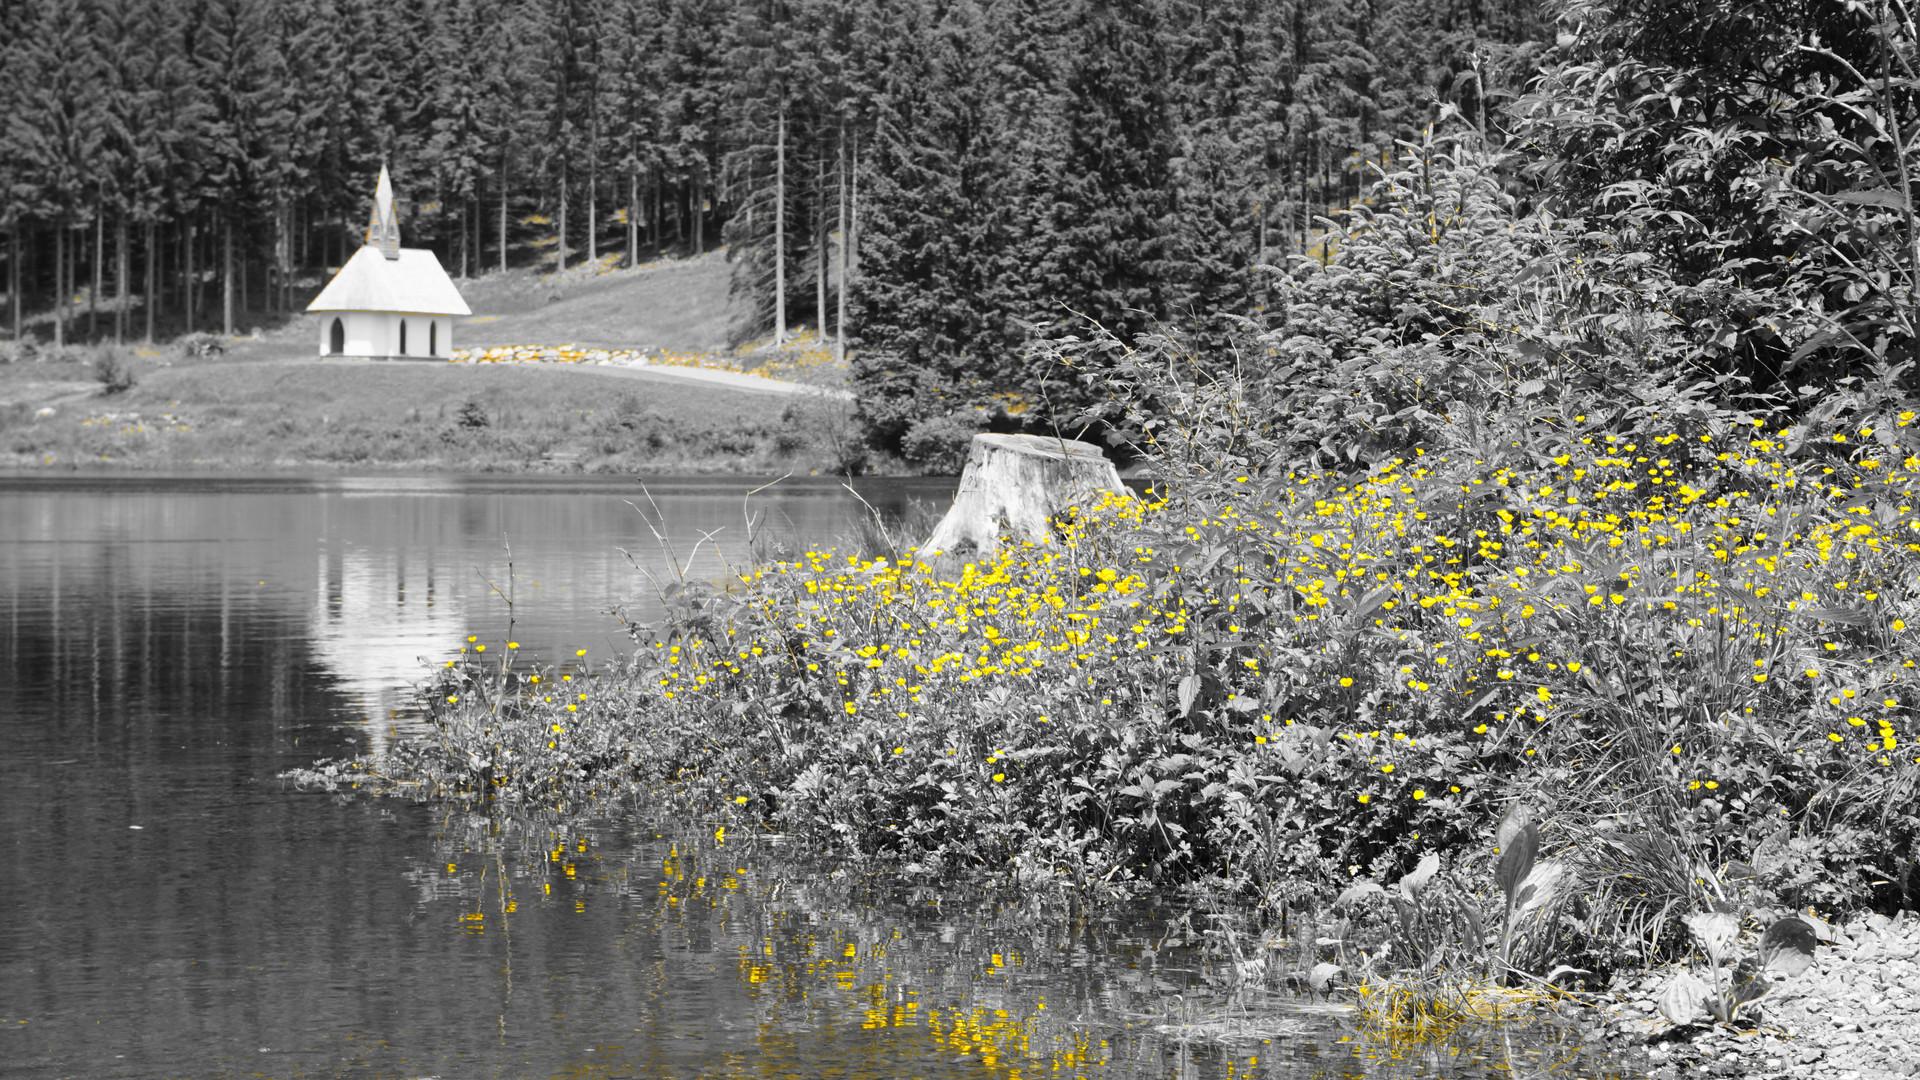 Kleinod und Naturidyll Ingeringsee